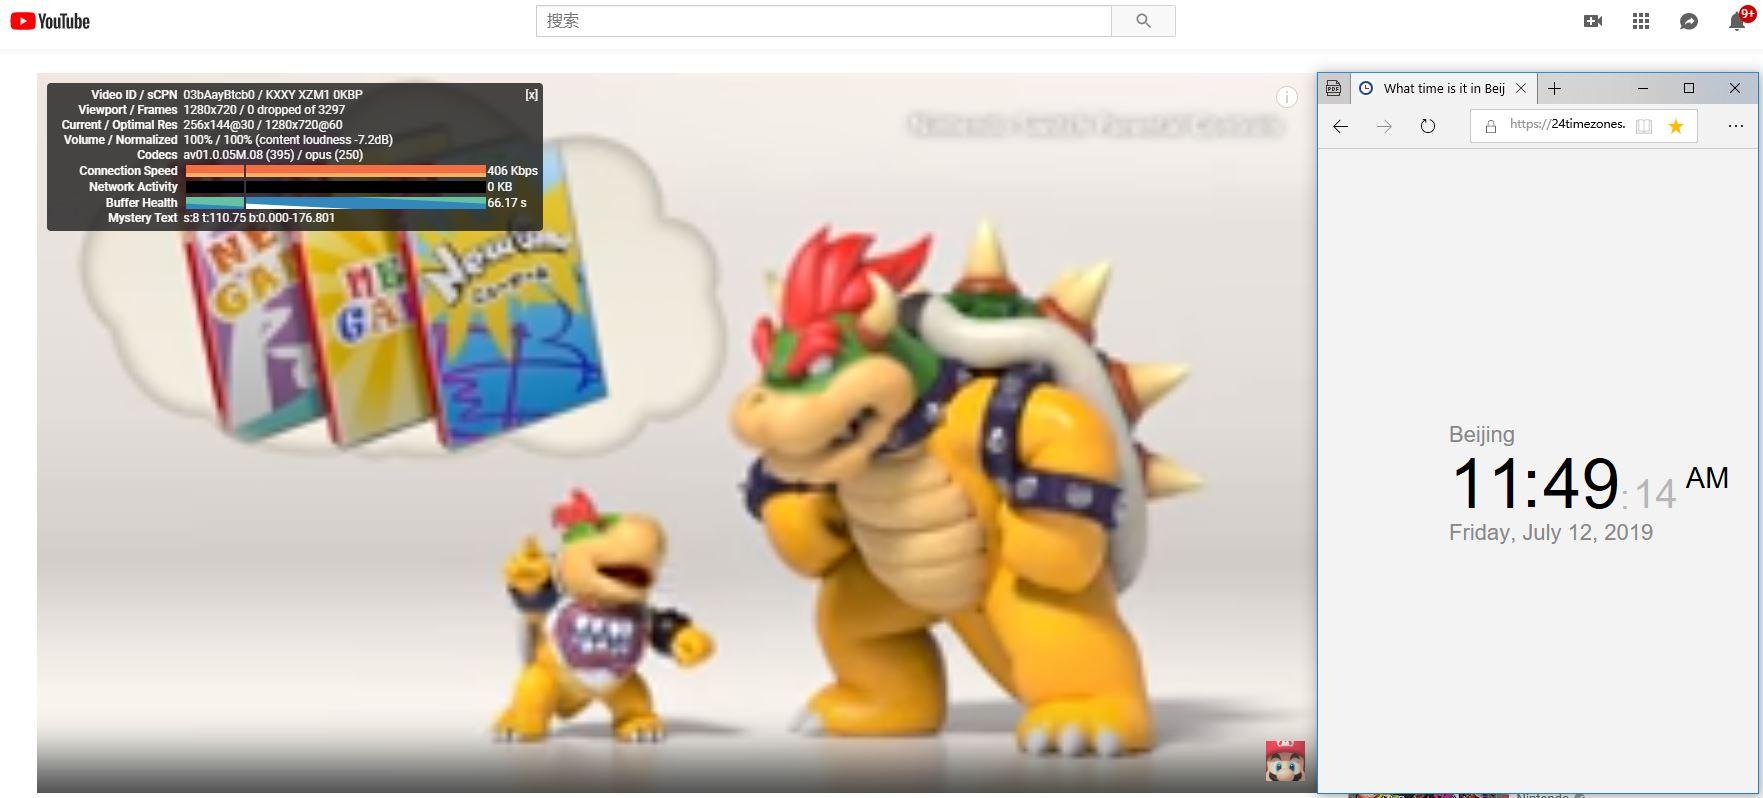 windows nordvpn 香港65节点 中国翻墙-科学上网 YouTube测试-20190712